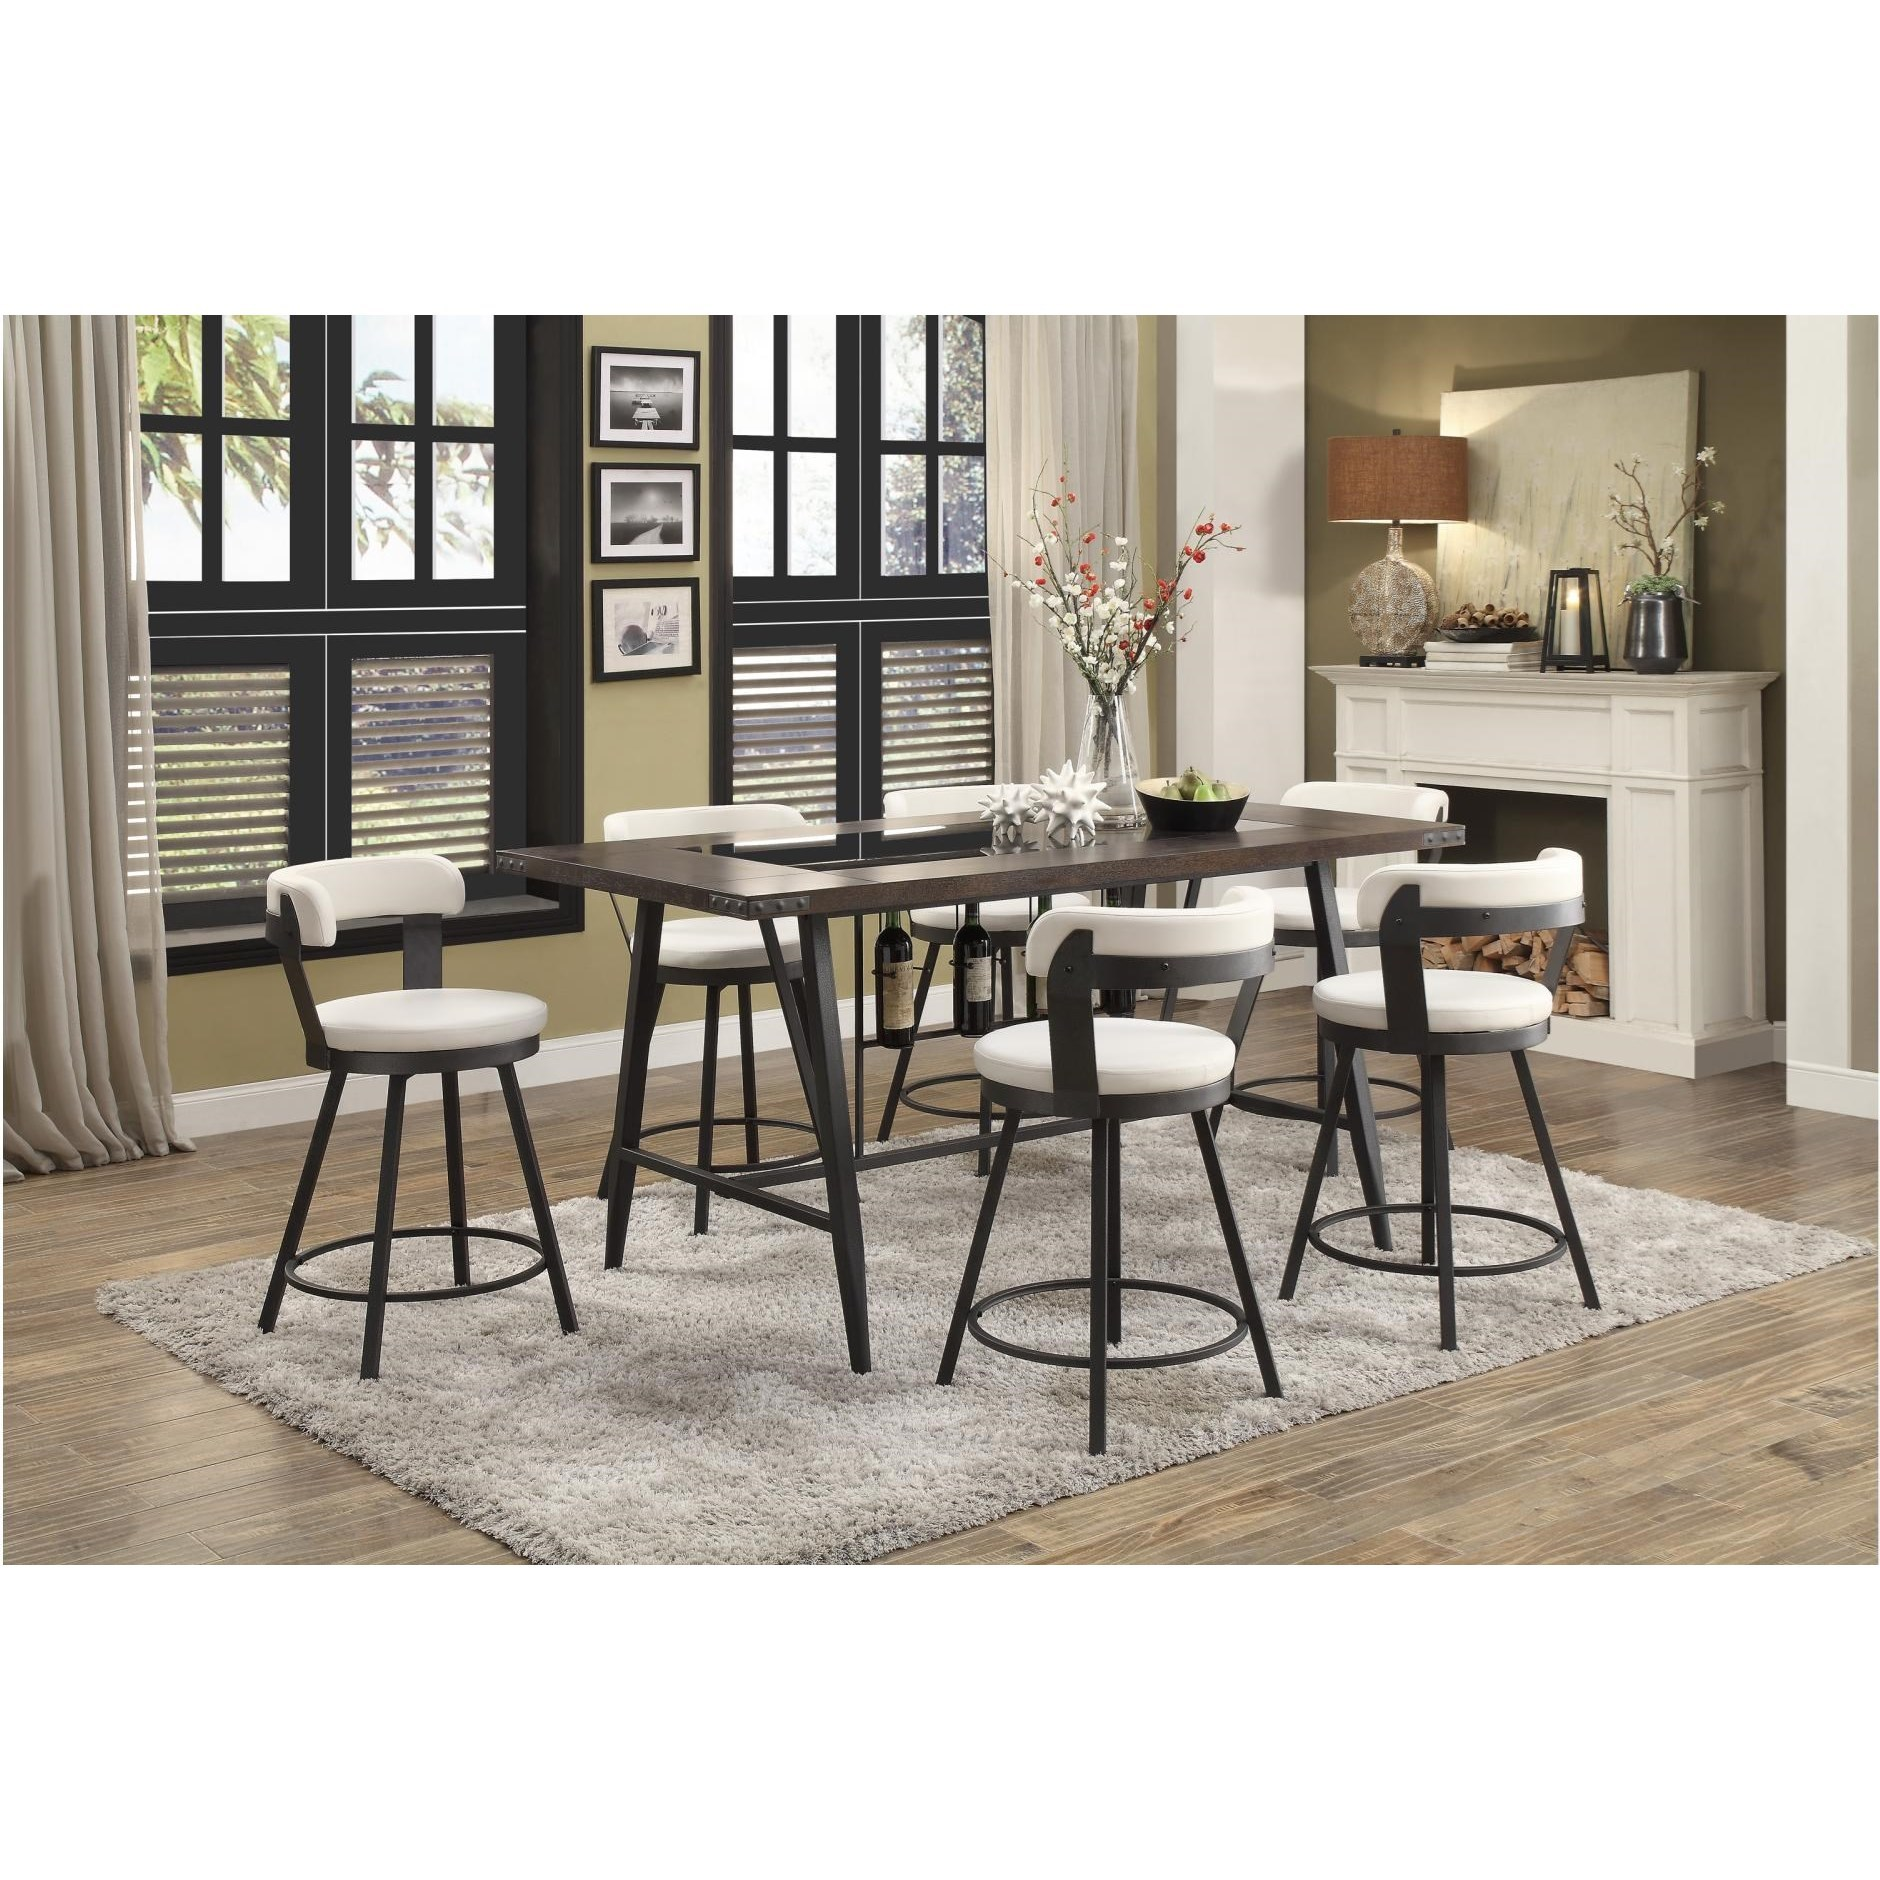 Appert 7 Piece Dining Set by Homelegance at Value City Furniture